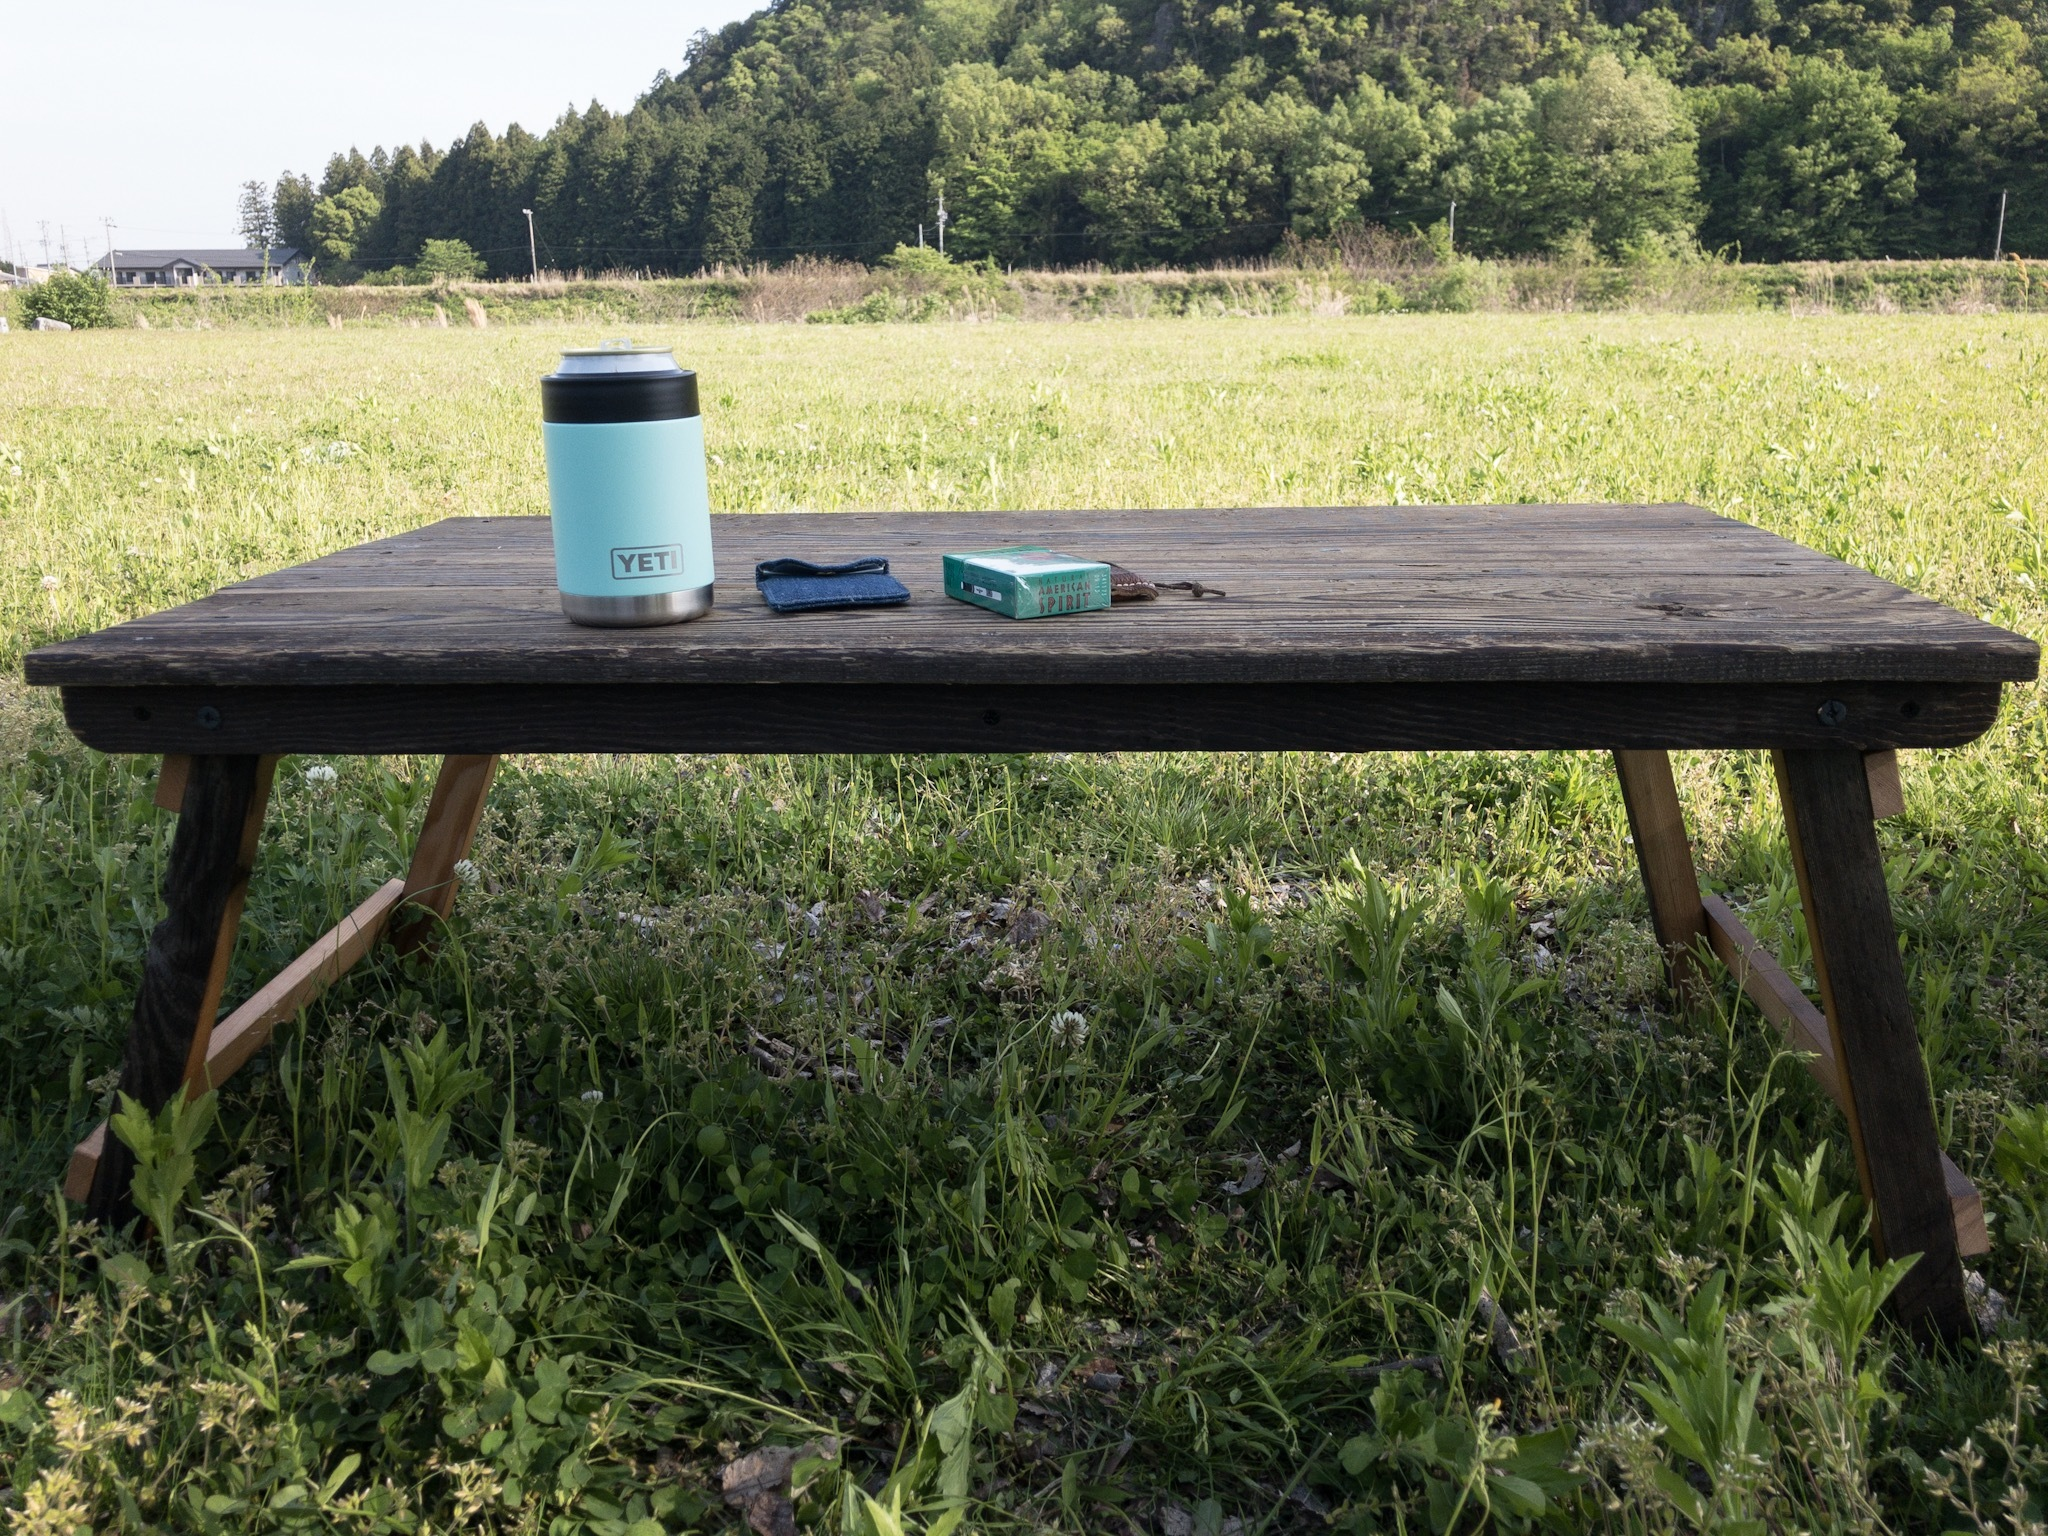 USED足場板×ダグラスファー古材折りたたみテーブル